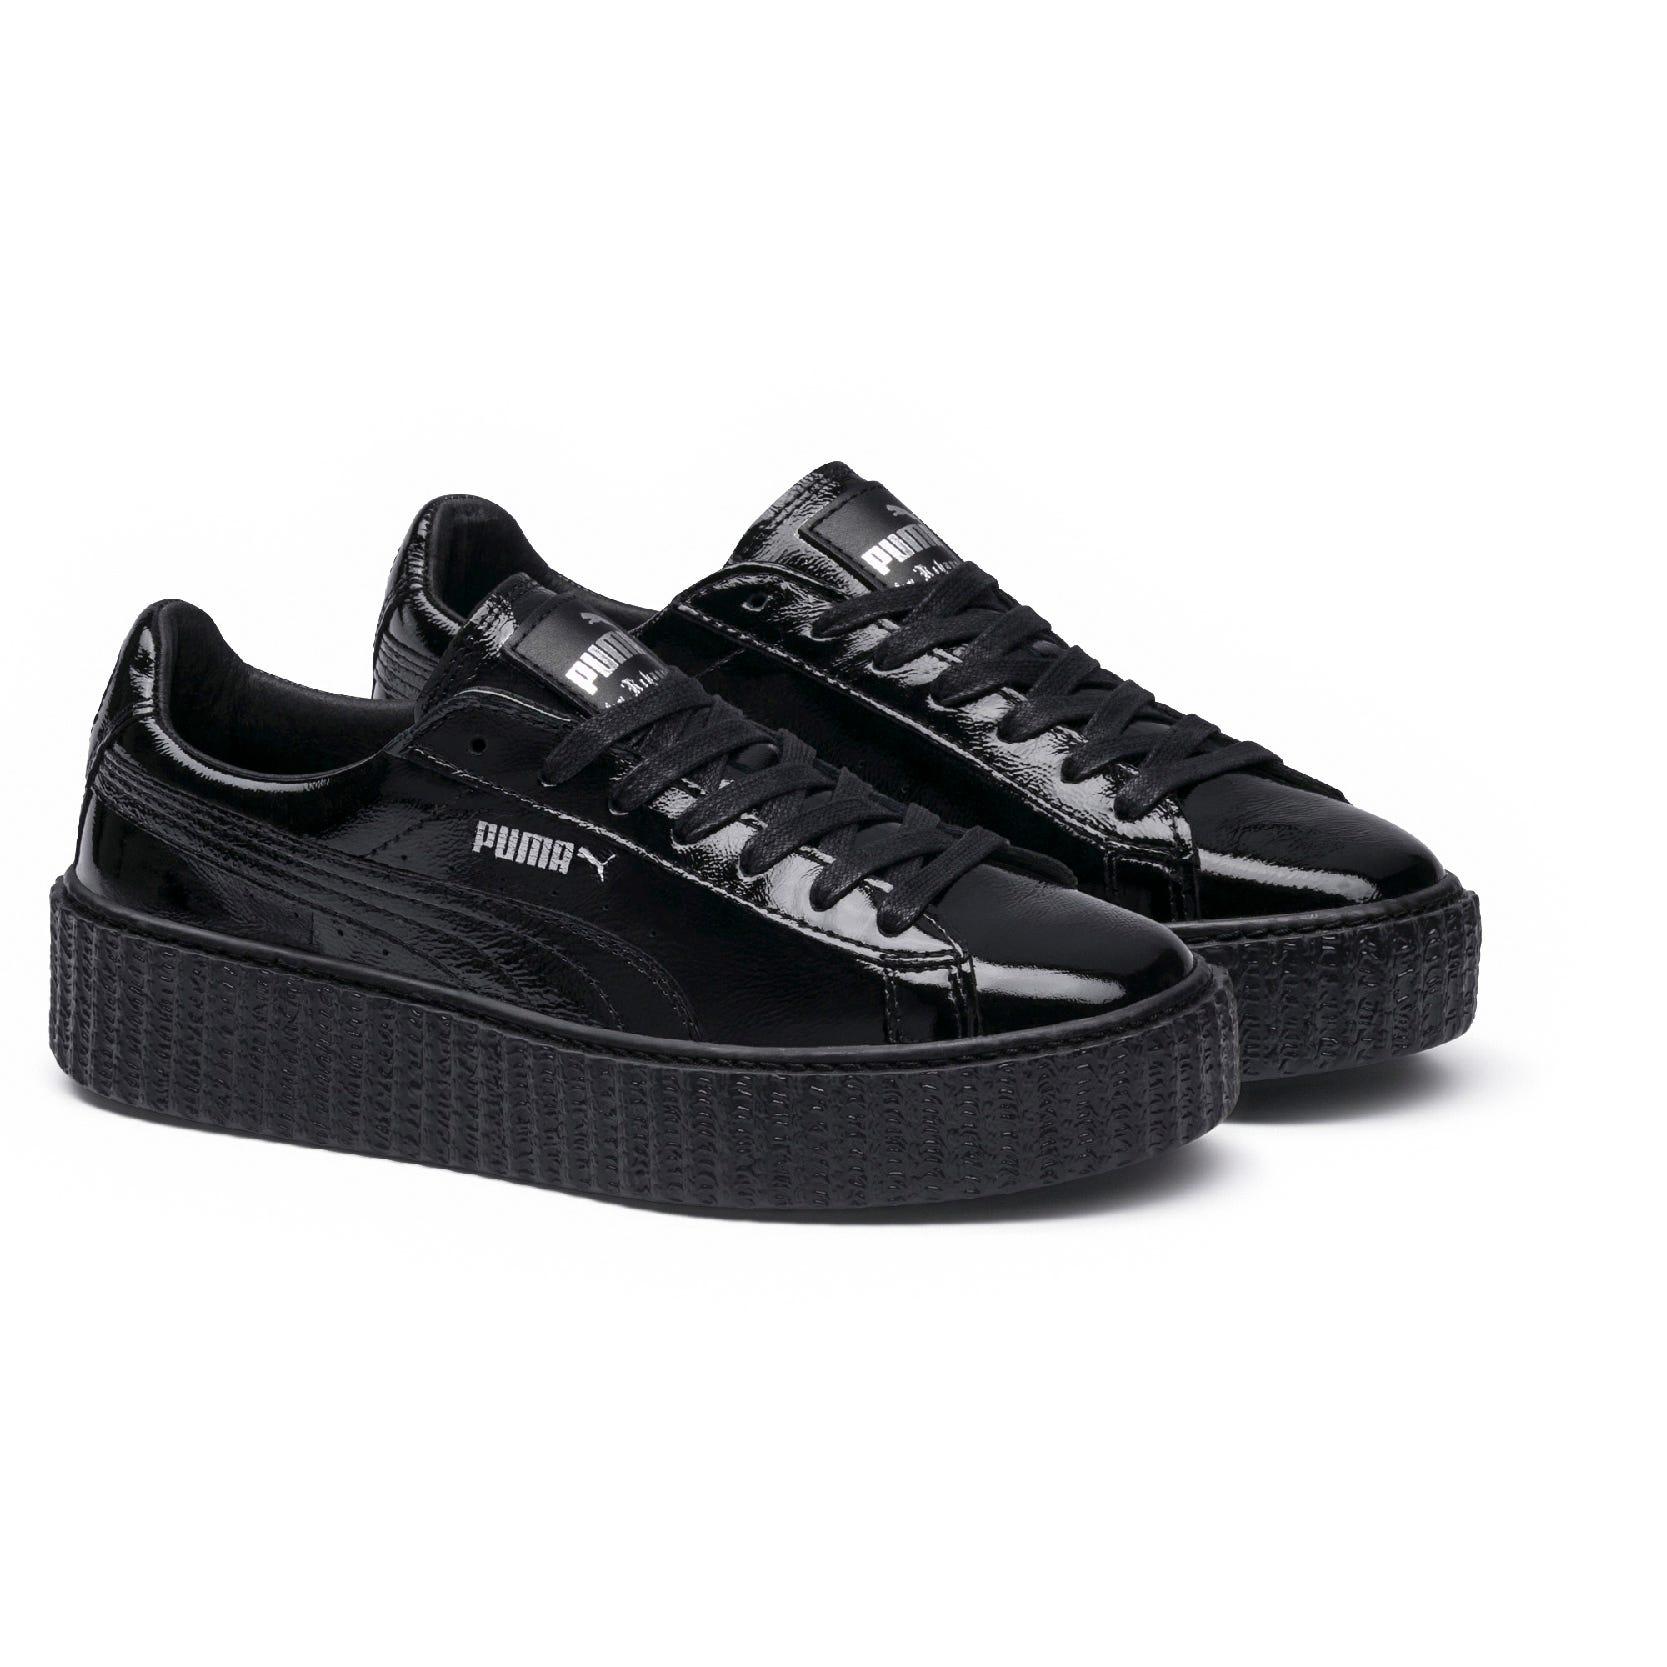 buy popular 9f5e7 42788 Rihanna Fenty Puma Creeper Sneaker New Black White Drop